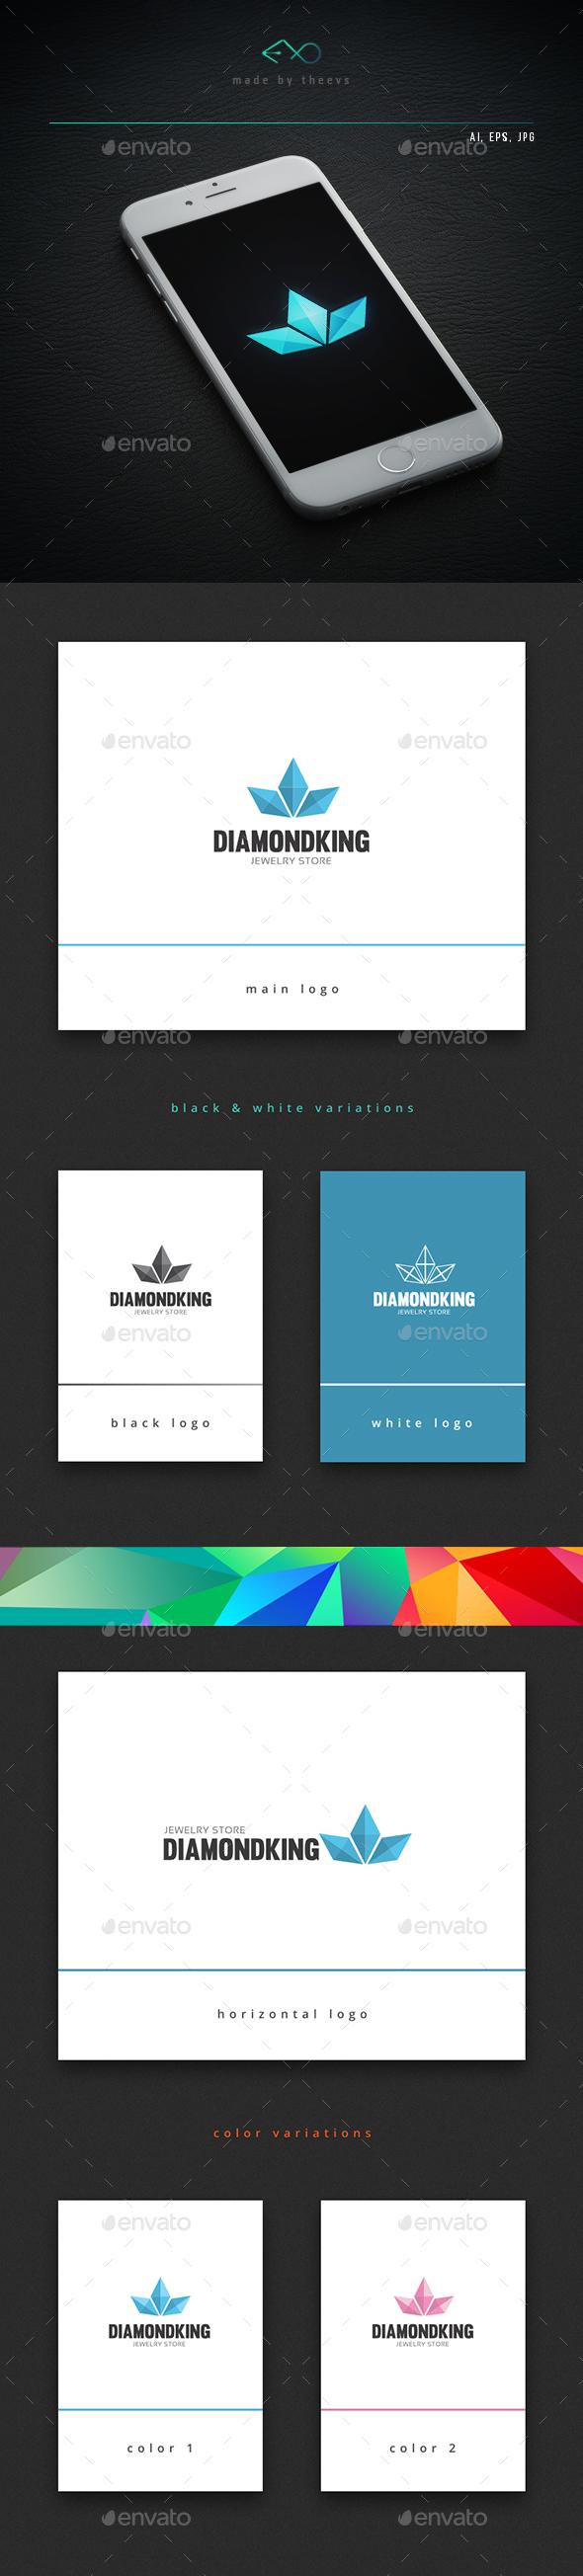 Diamondking - Objects Logo Templates